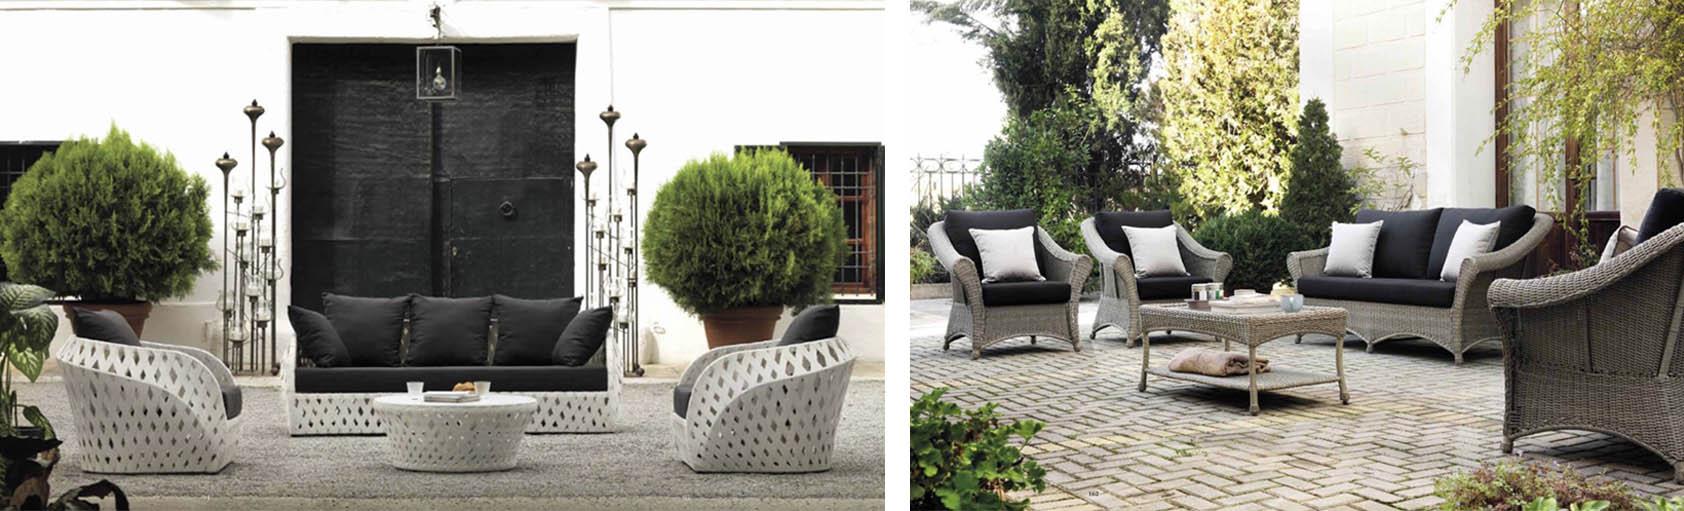 Muebles exterior de Muebles Toscana